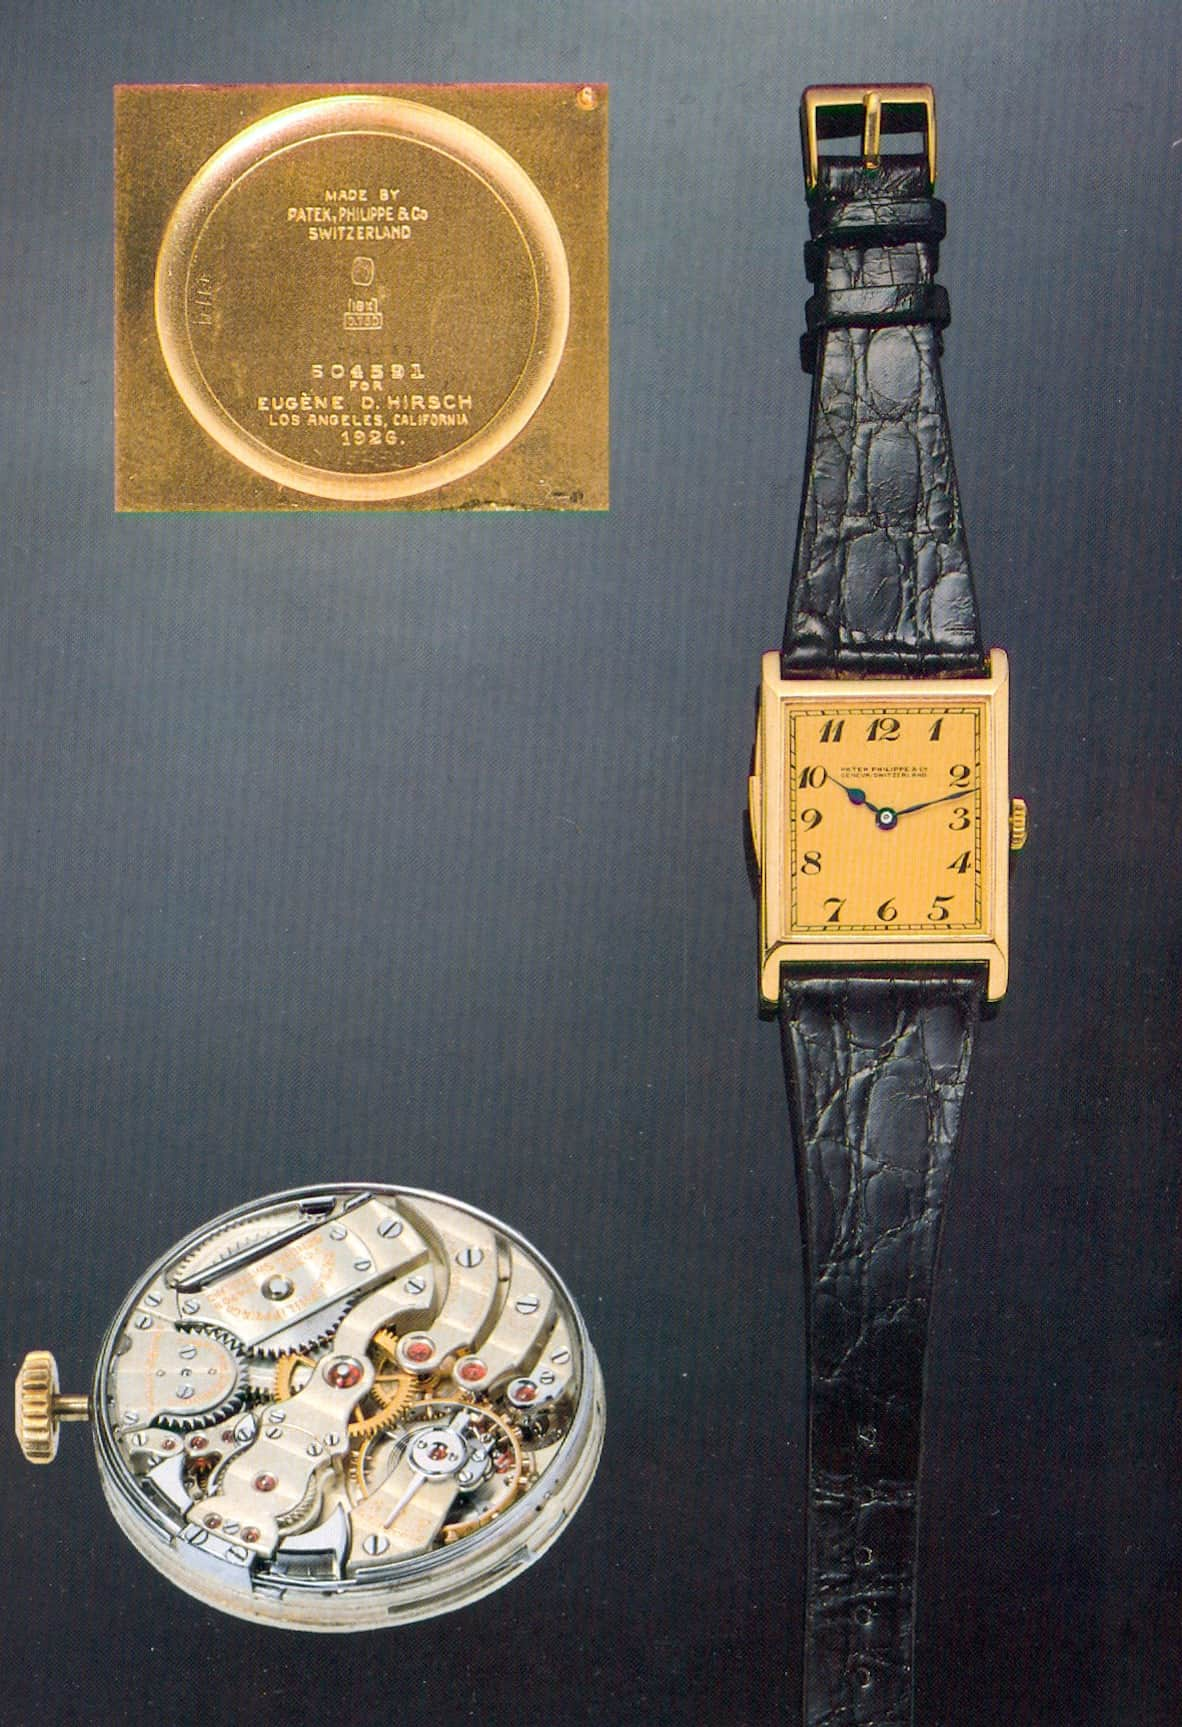 Patek Philippe Armbanduhr mit Minutenrepetition aus dem Jahr 1927